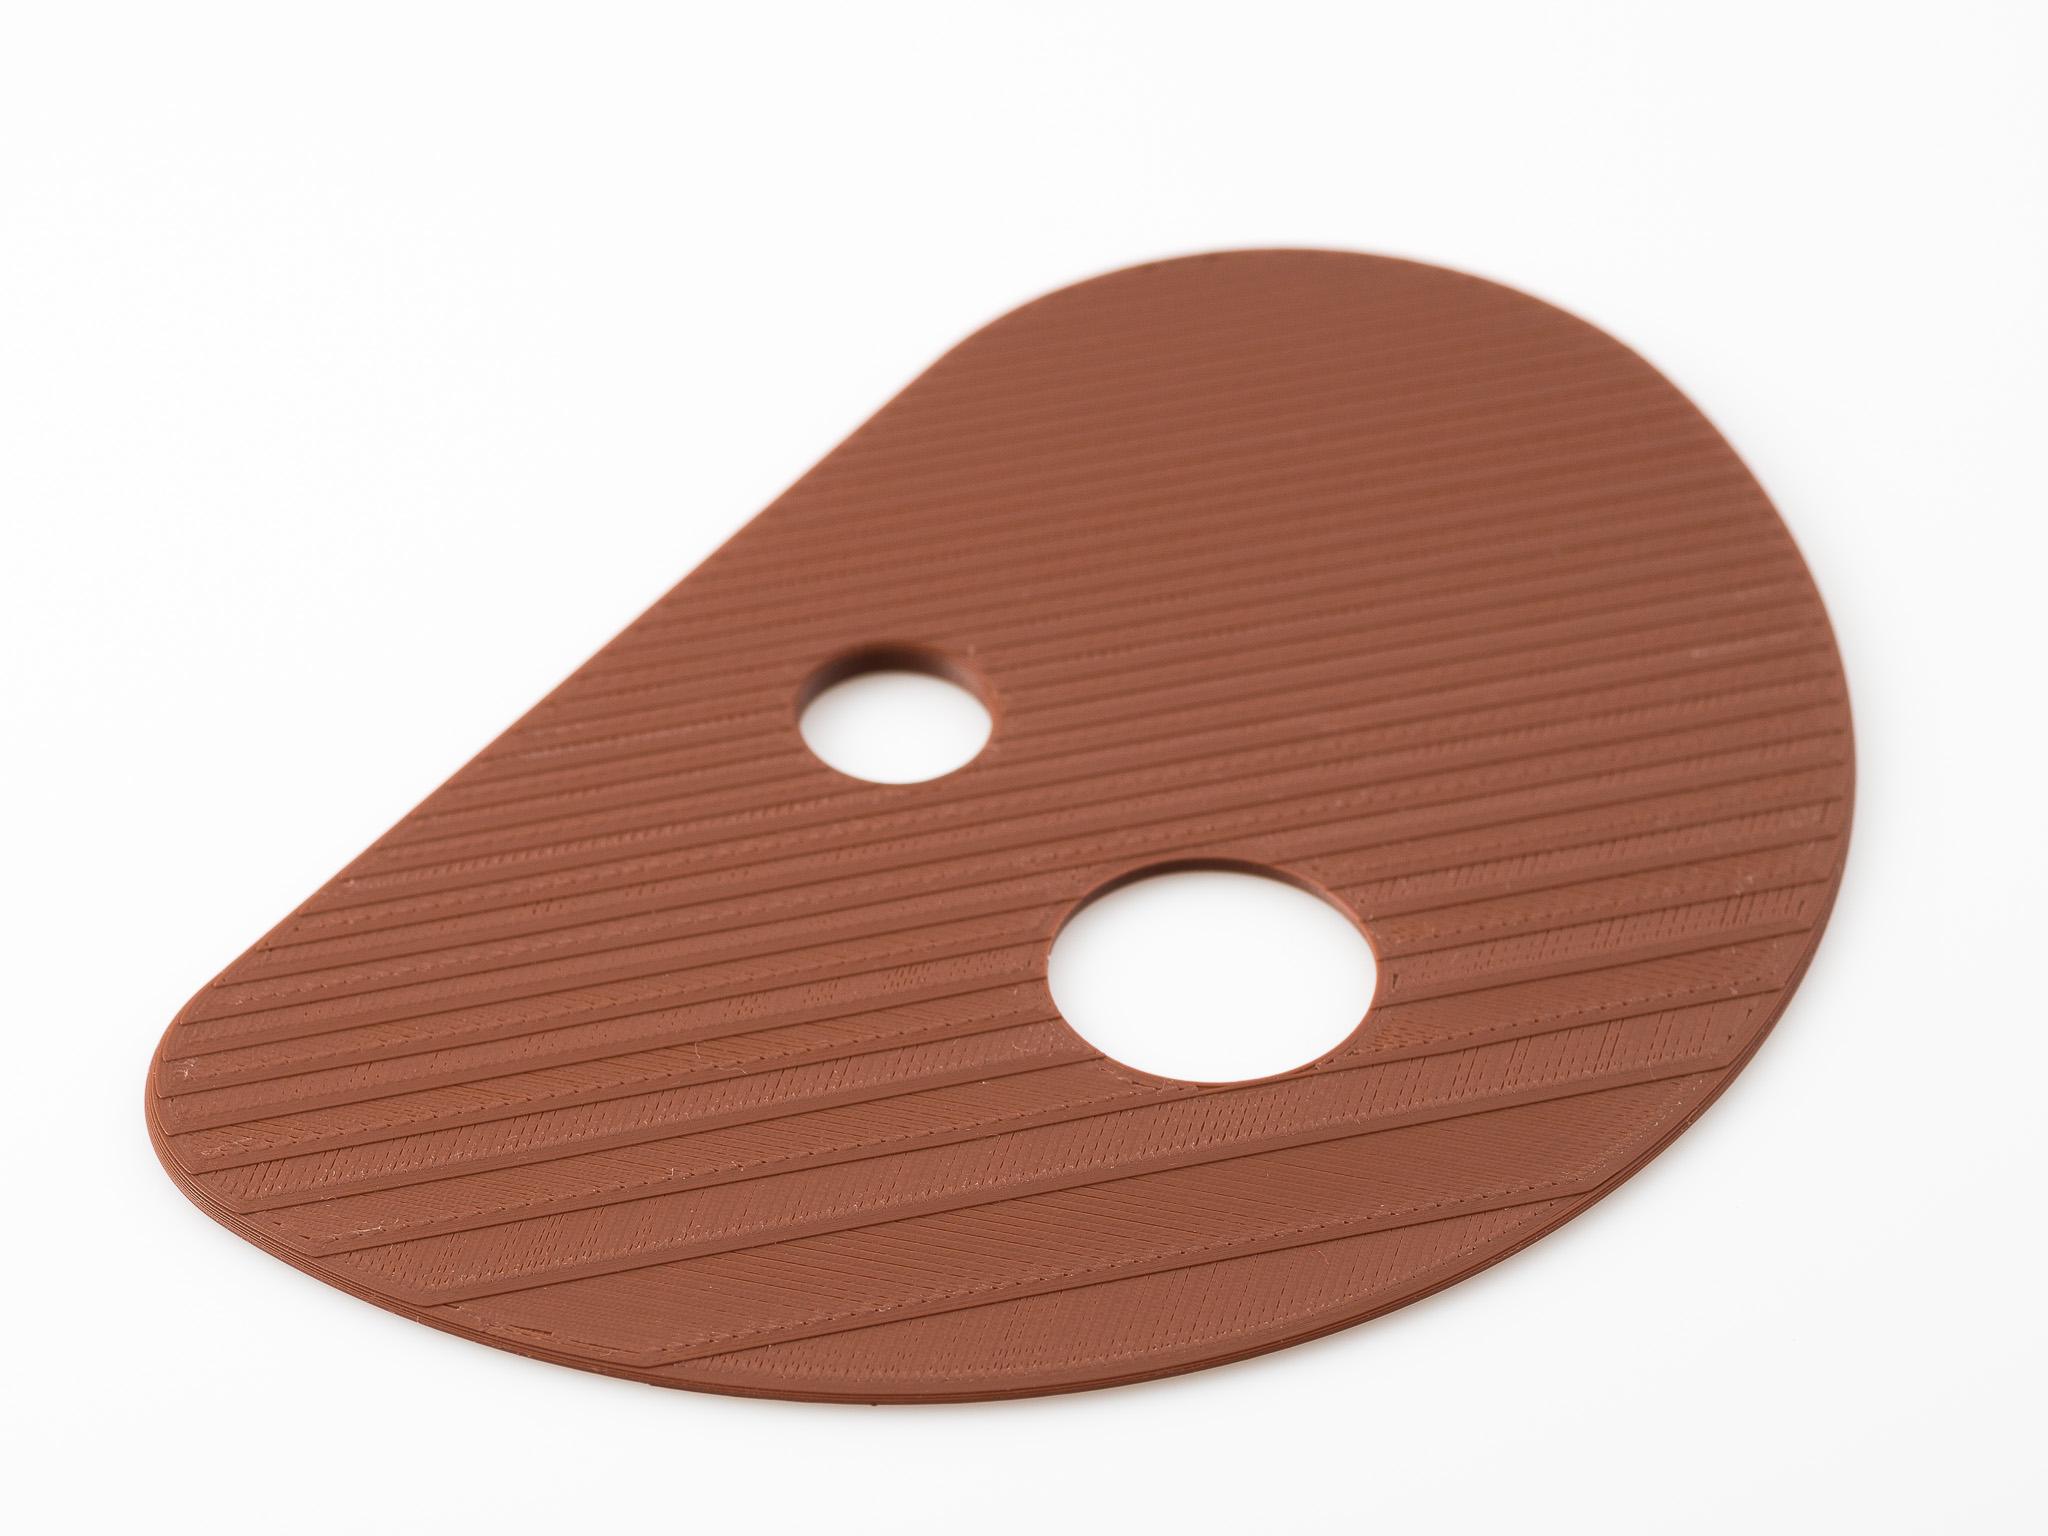 IMGP1031.jpg Download free STL file Round Scraper • 3D printing template, WalterHsiao